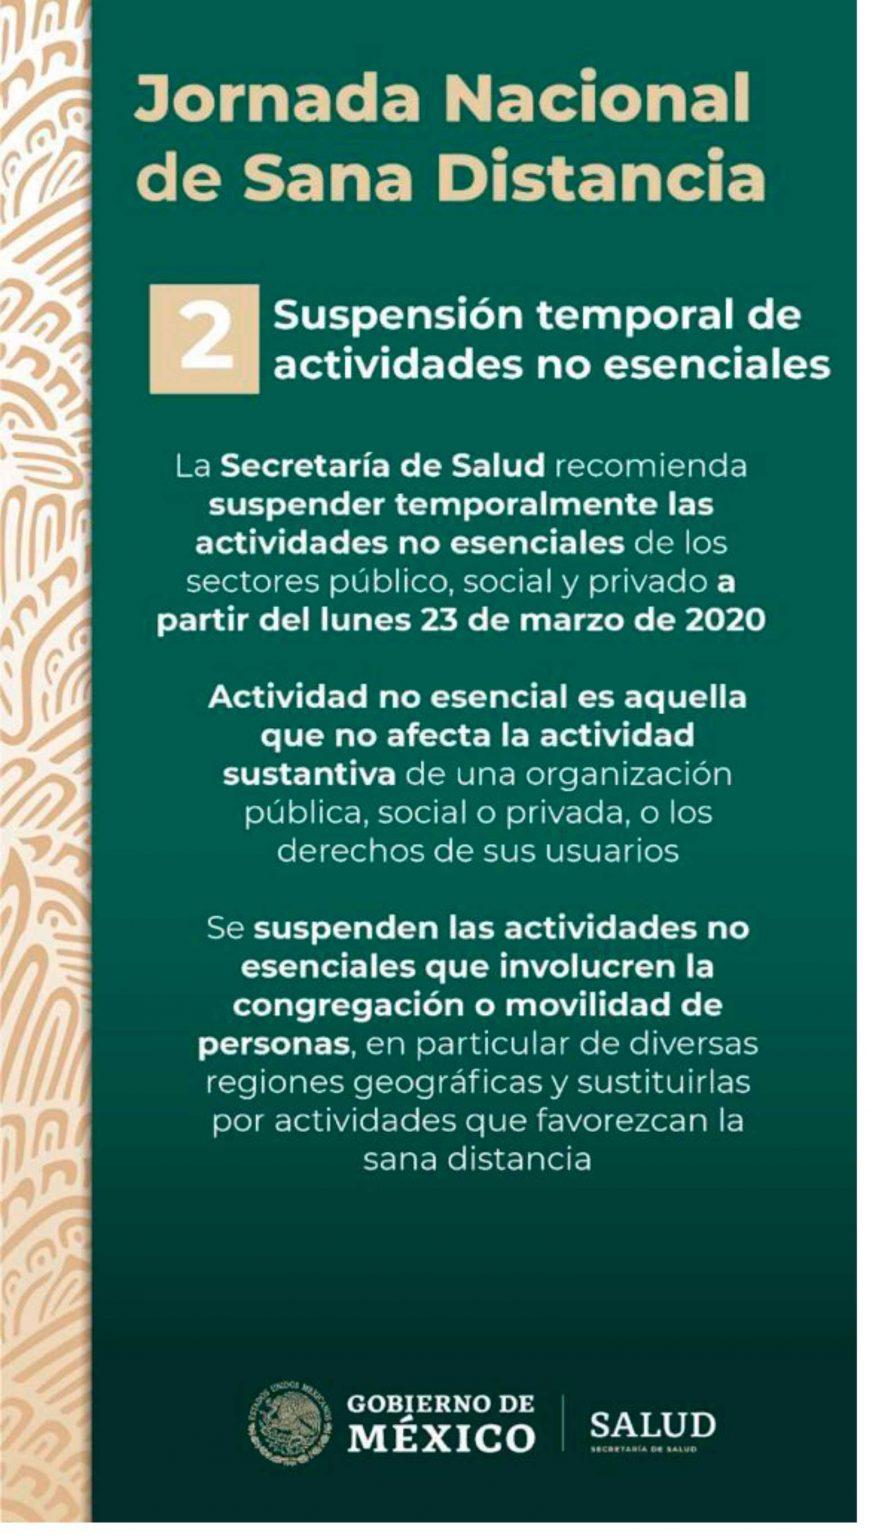 Jornada_Nacional_de_Sana_Distancia-2